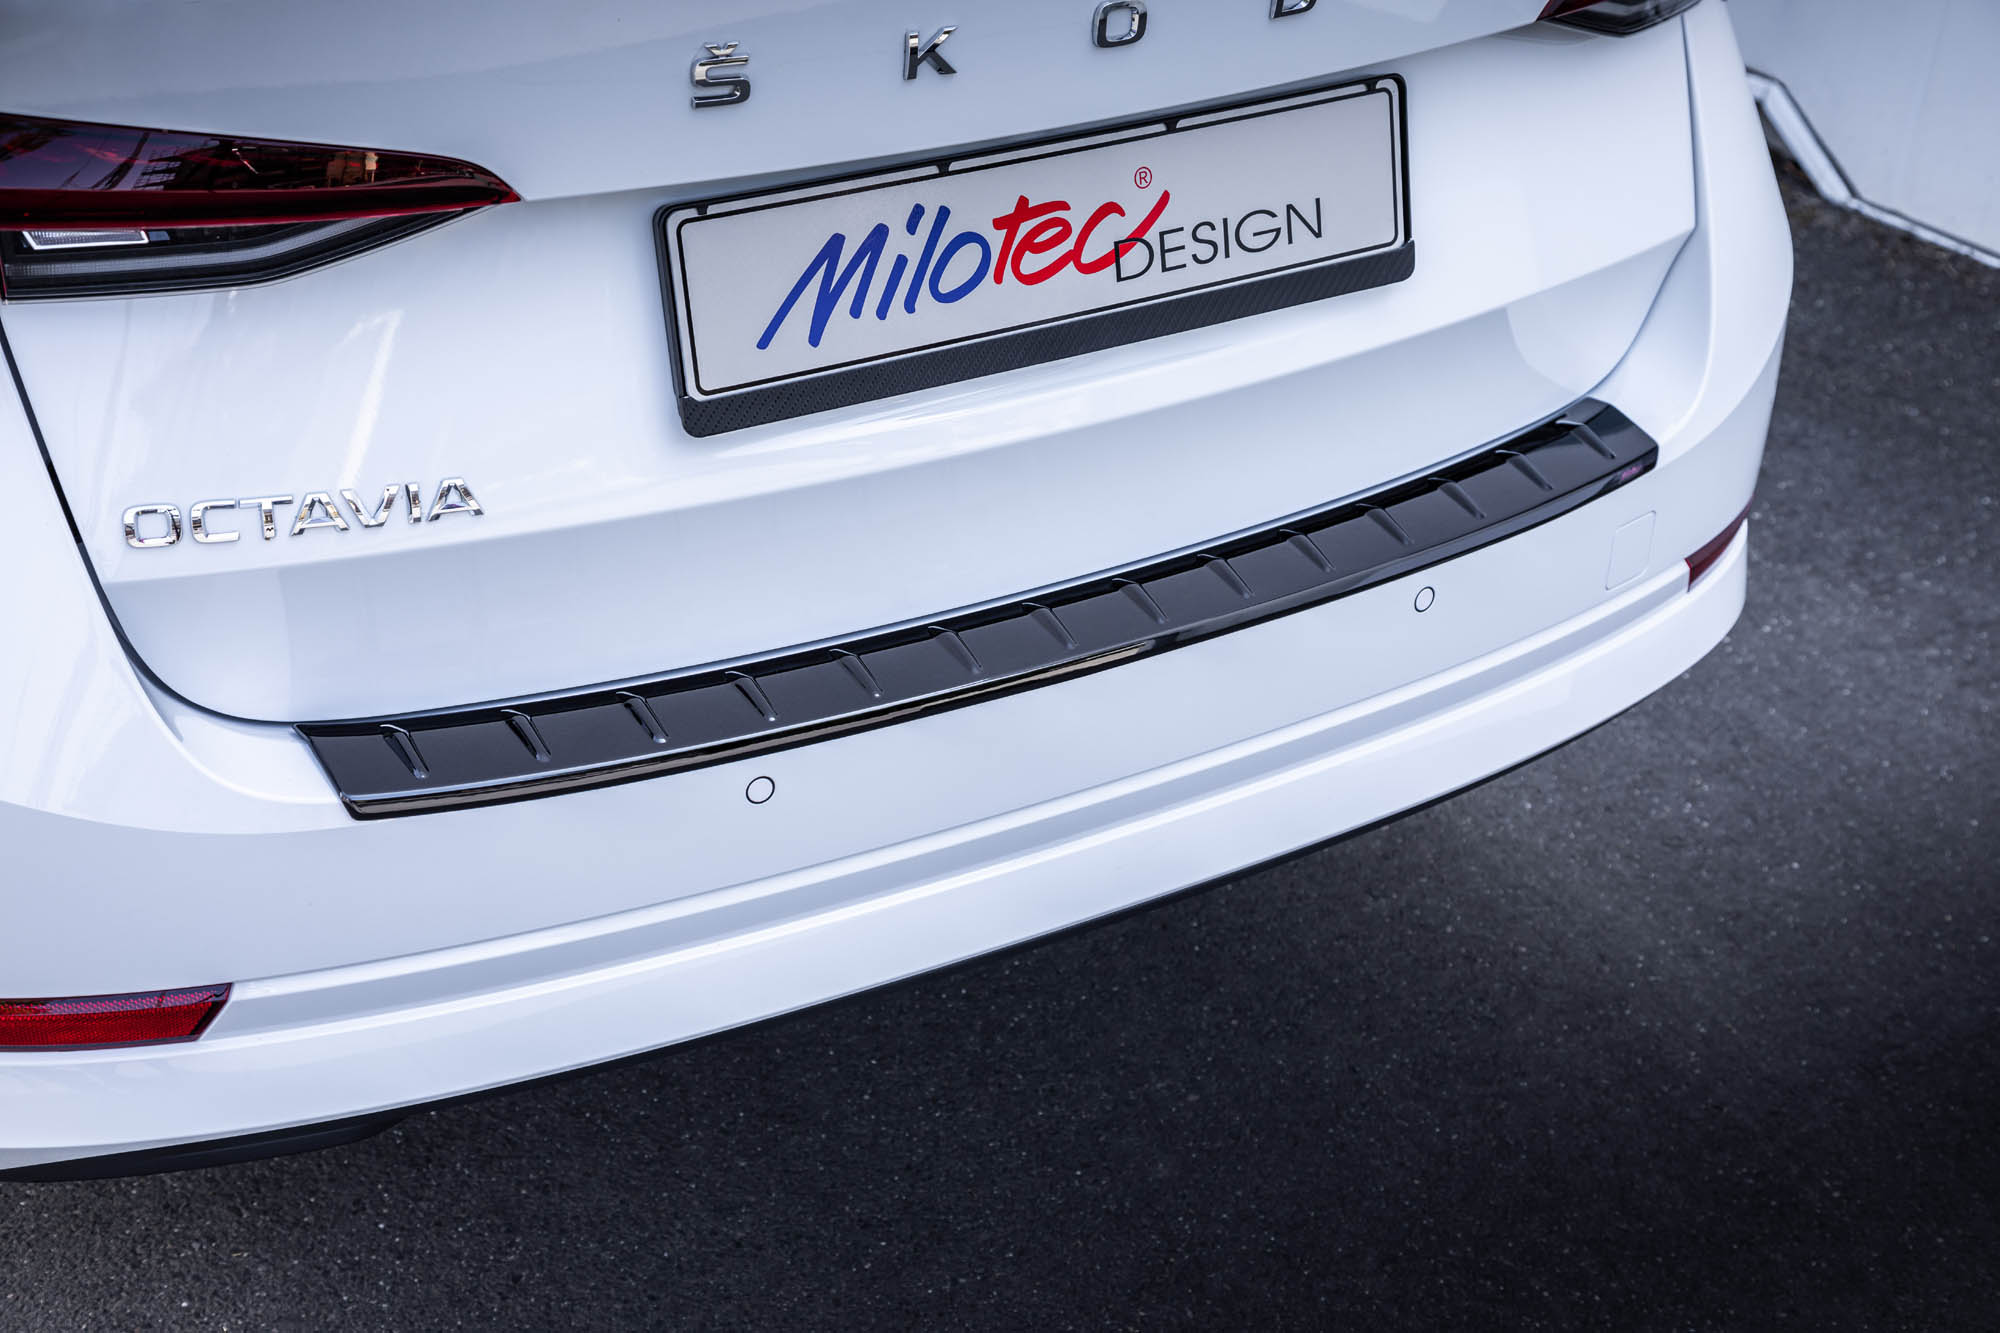 Milotec Loading Edge Protection For Octavia Iv Combi Rs Combi Abs Piano Black Milotec Auto Extras Gmbh Skoda Tuning Und Zubehor